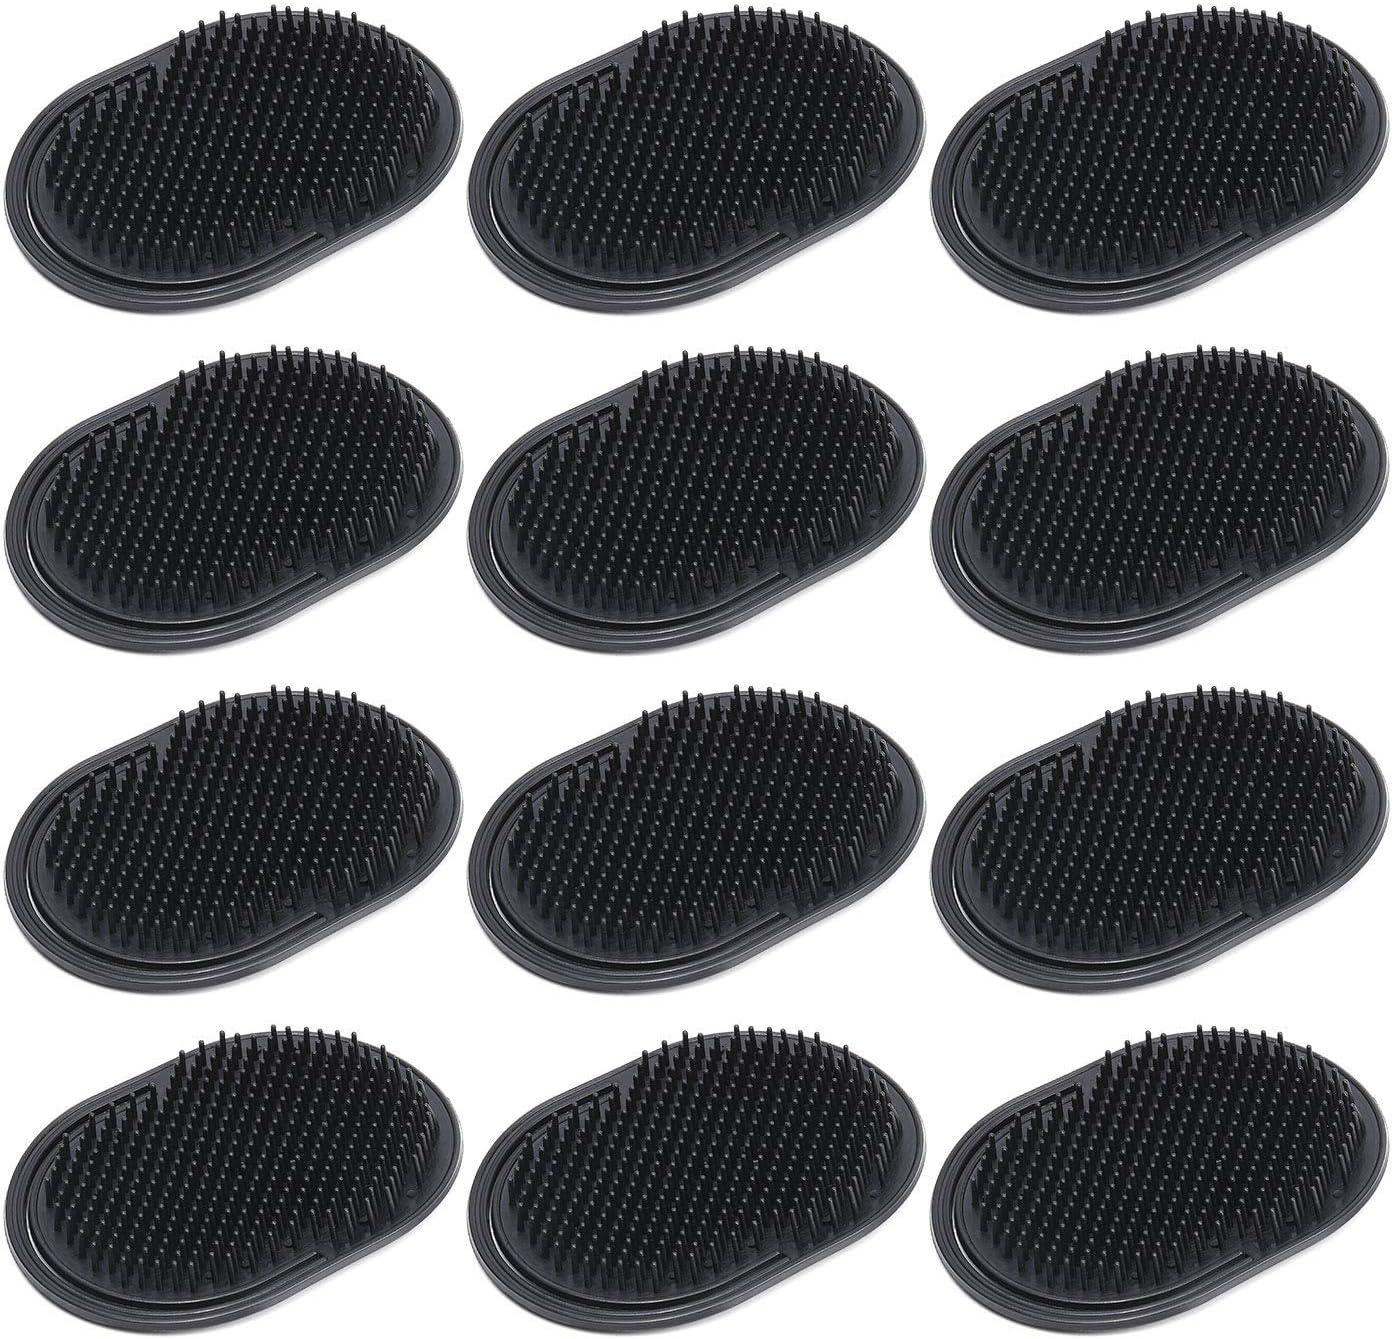 Pocket Mens Challenge the lowest price of Japan ☆ Short Hair unisex Brush Portable Comb Bea Black